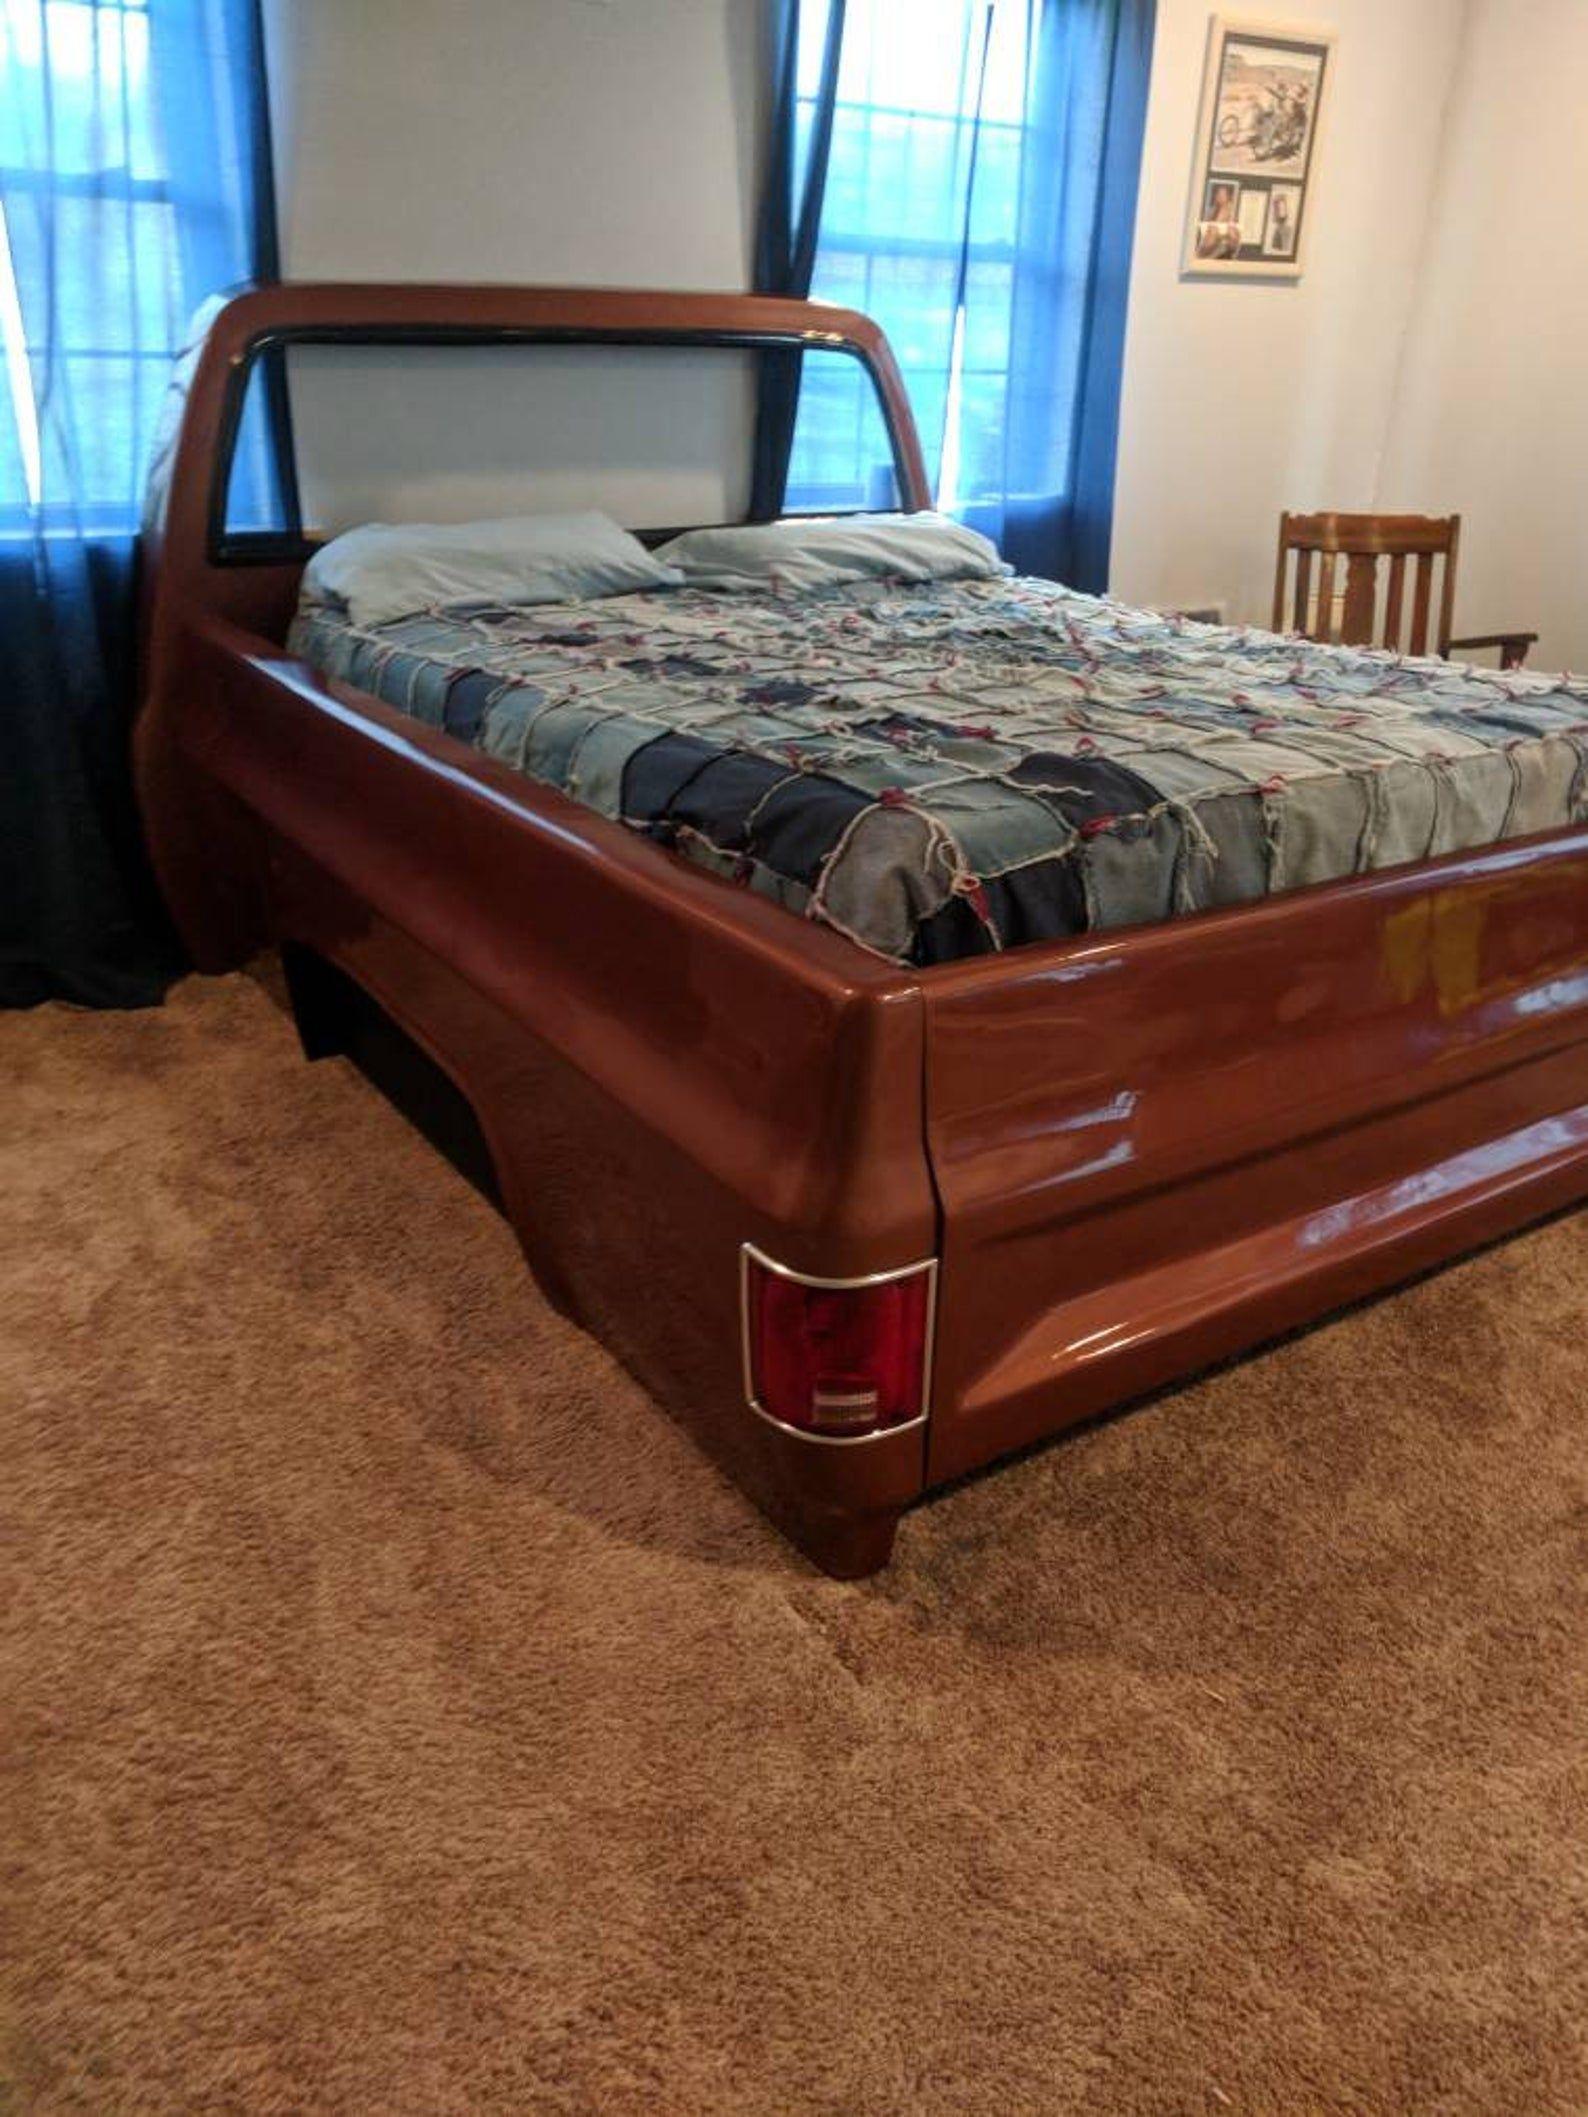 Queen Size Square body bed mancave decor garage furniture